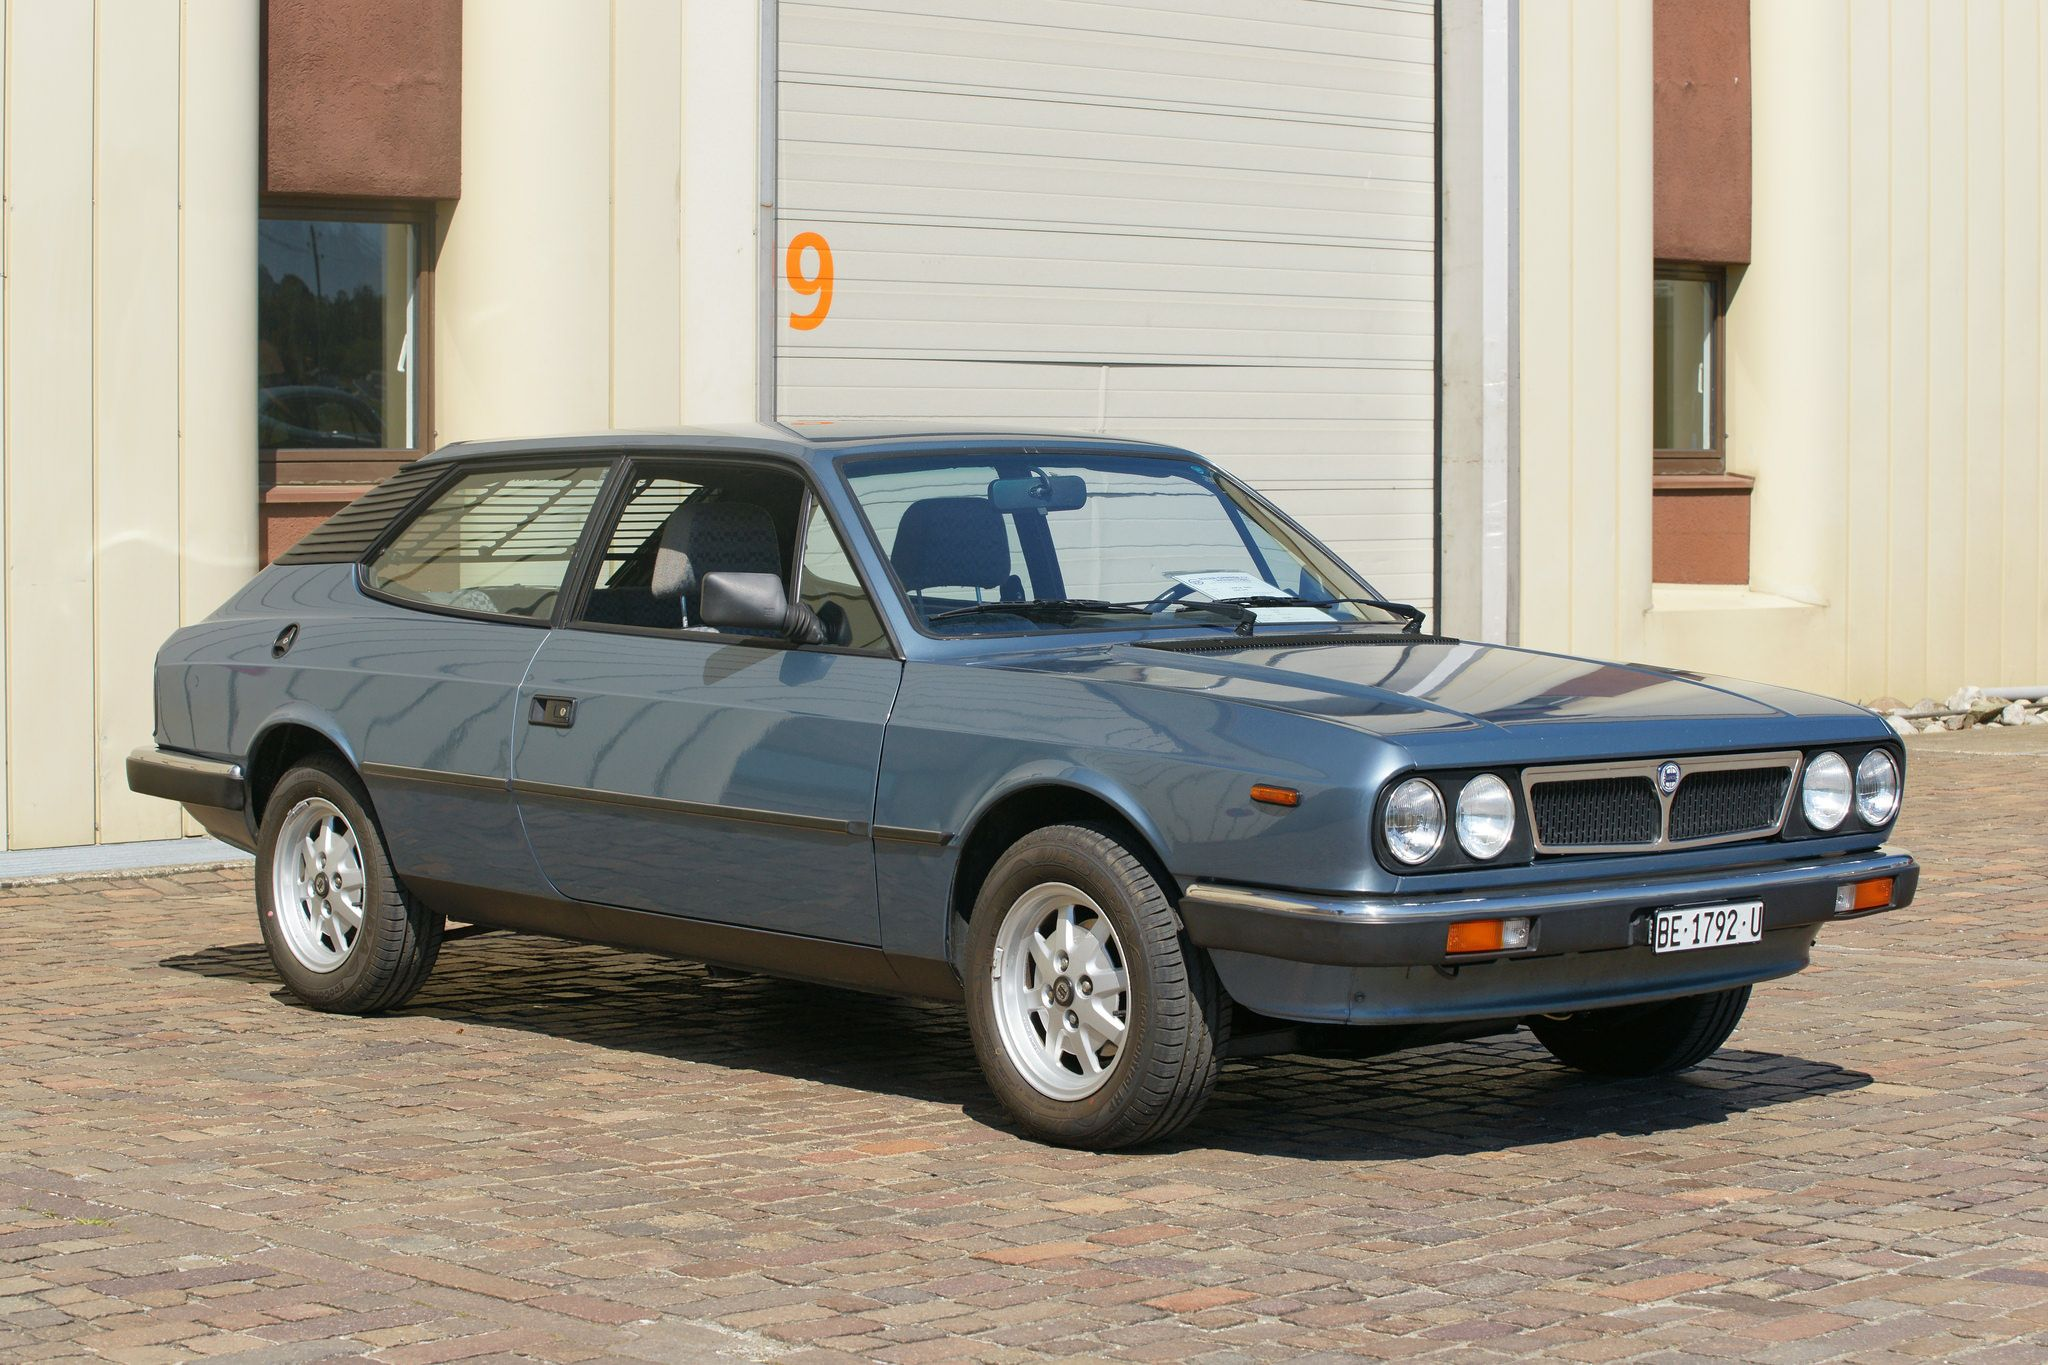 Lancia beta 2000 hpe 3082015 2759 cars lancia beta 2000 hpe 3082015 2759 lancia italy classic cars in bleienbach schweiz vanachro Images